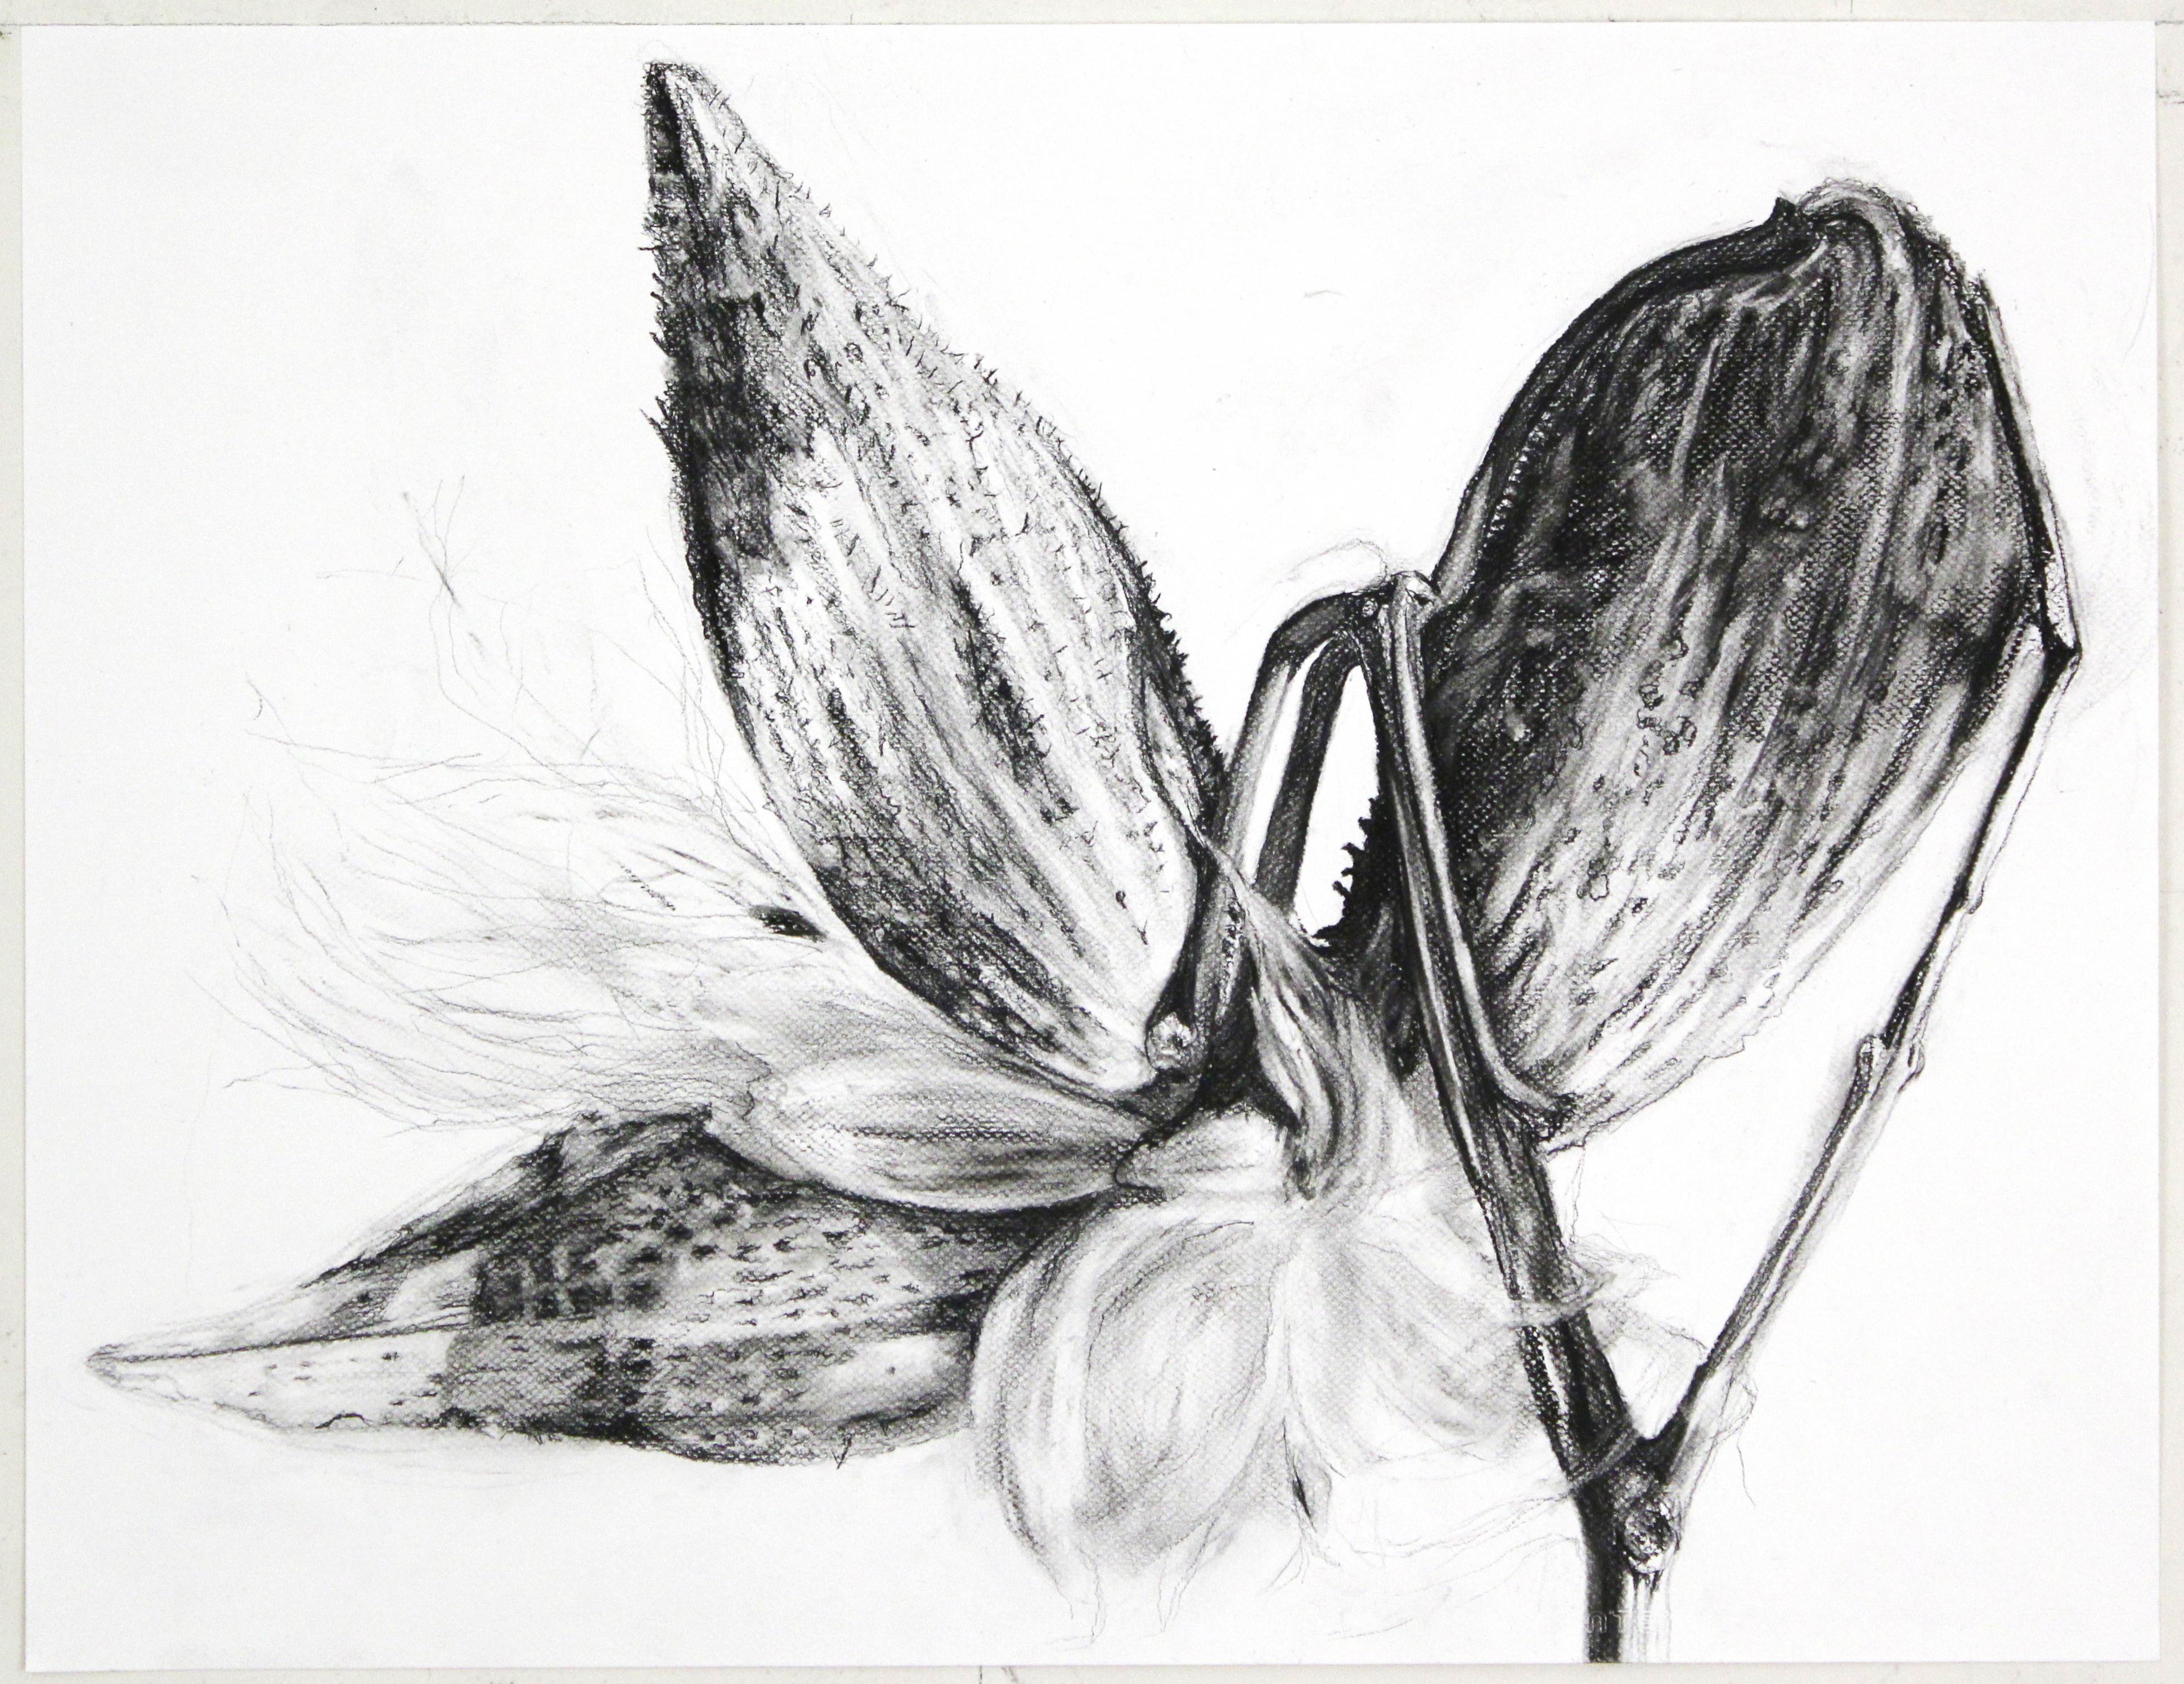 """Milkweed"" by Tara Shukla"